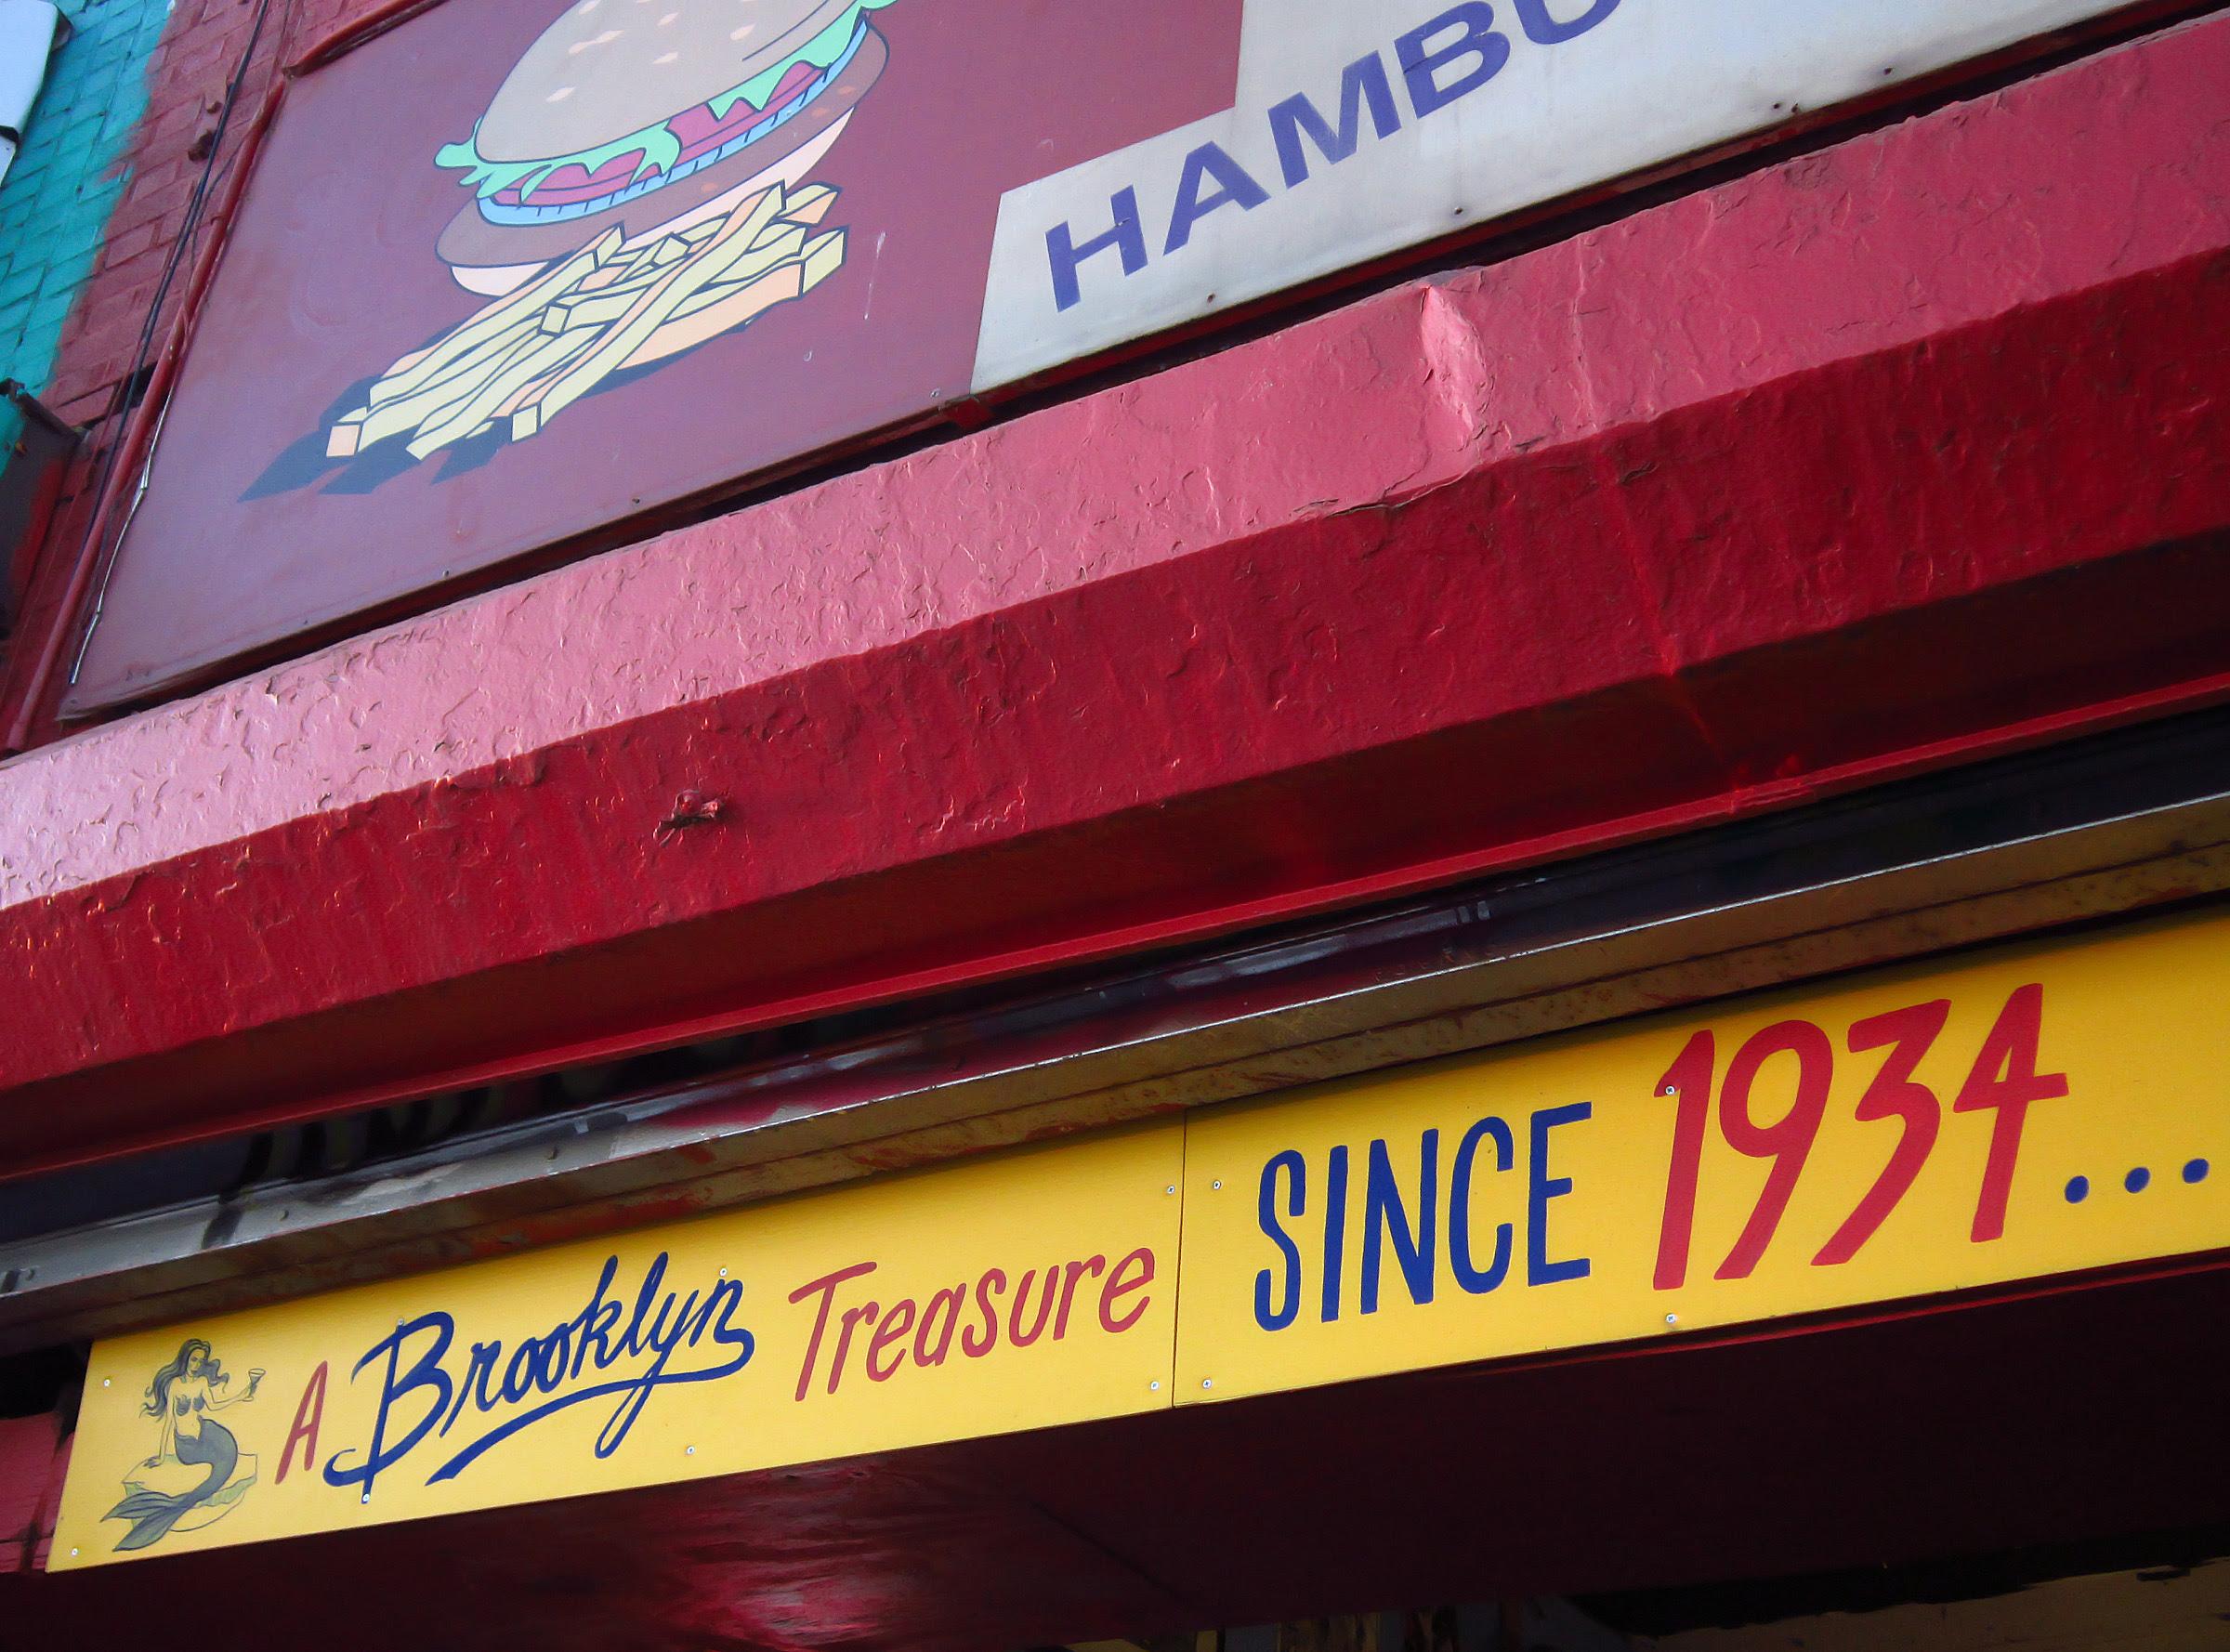 A Brooklyn treasure...